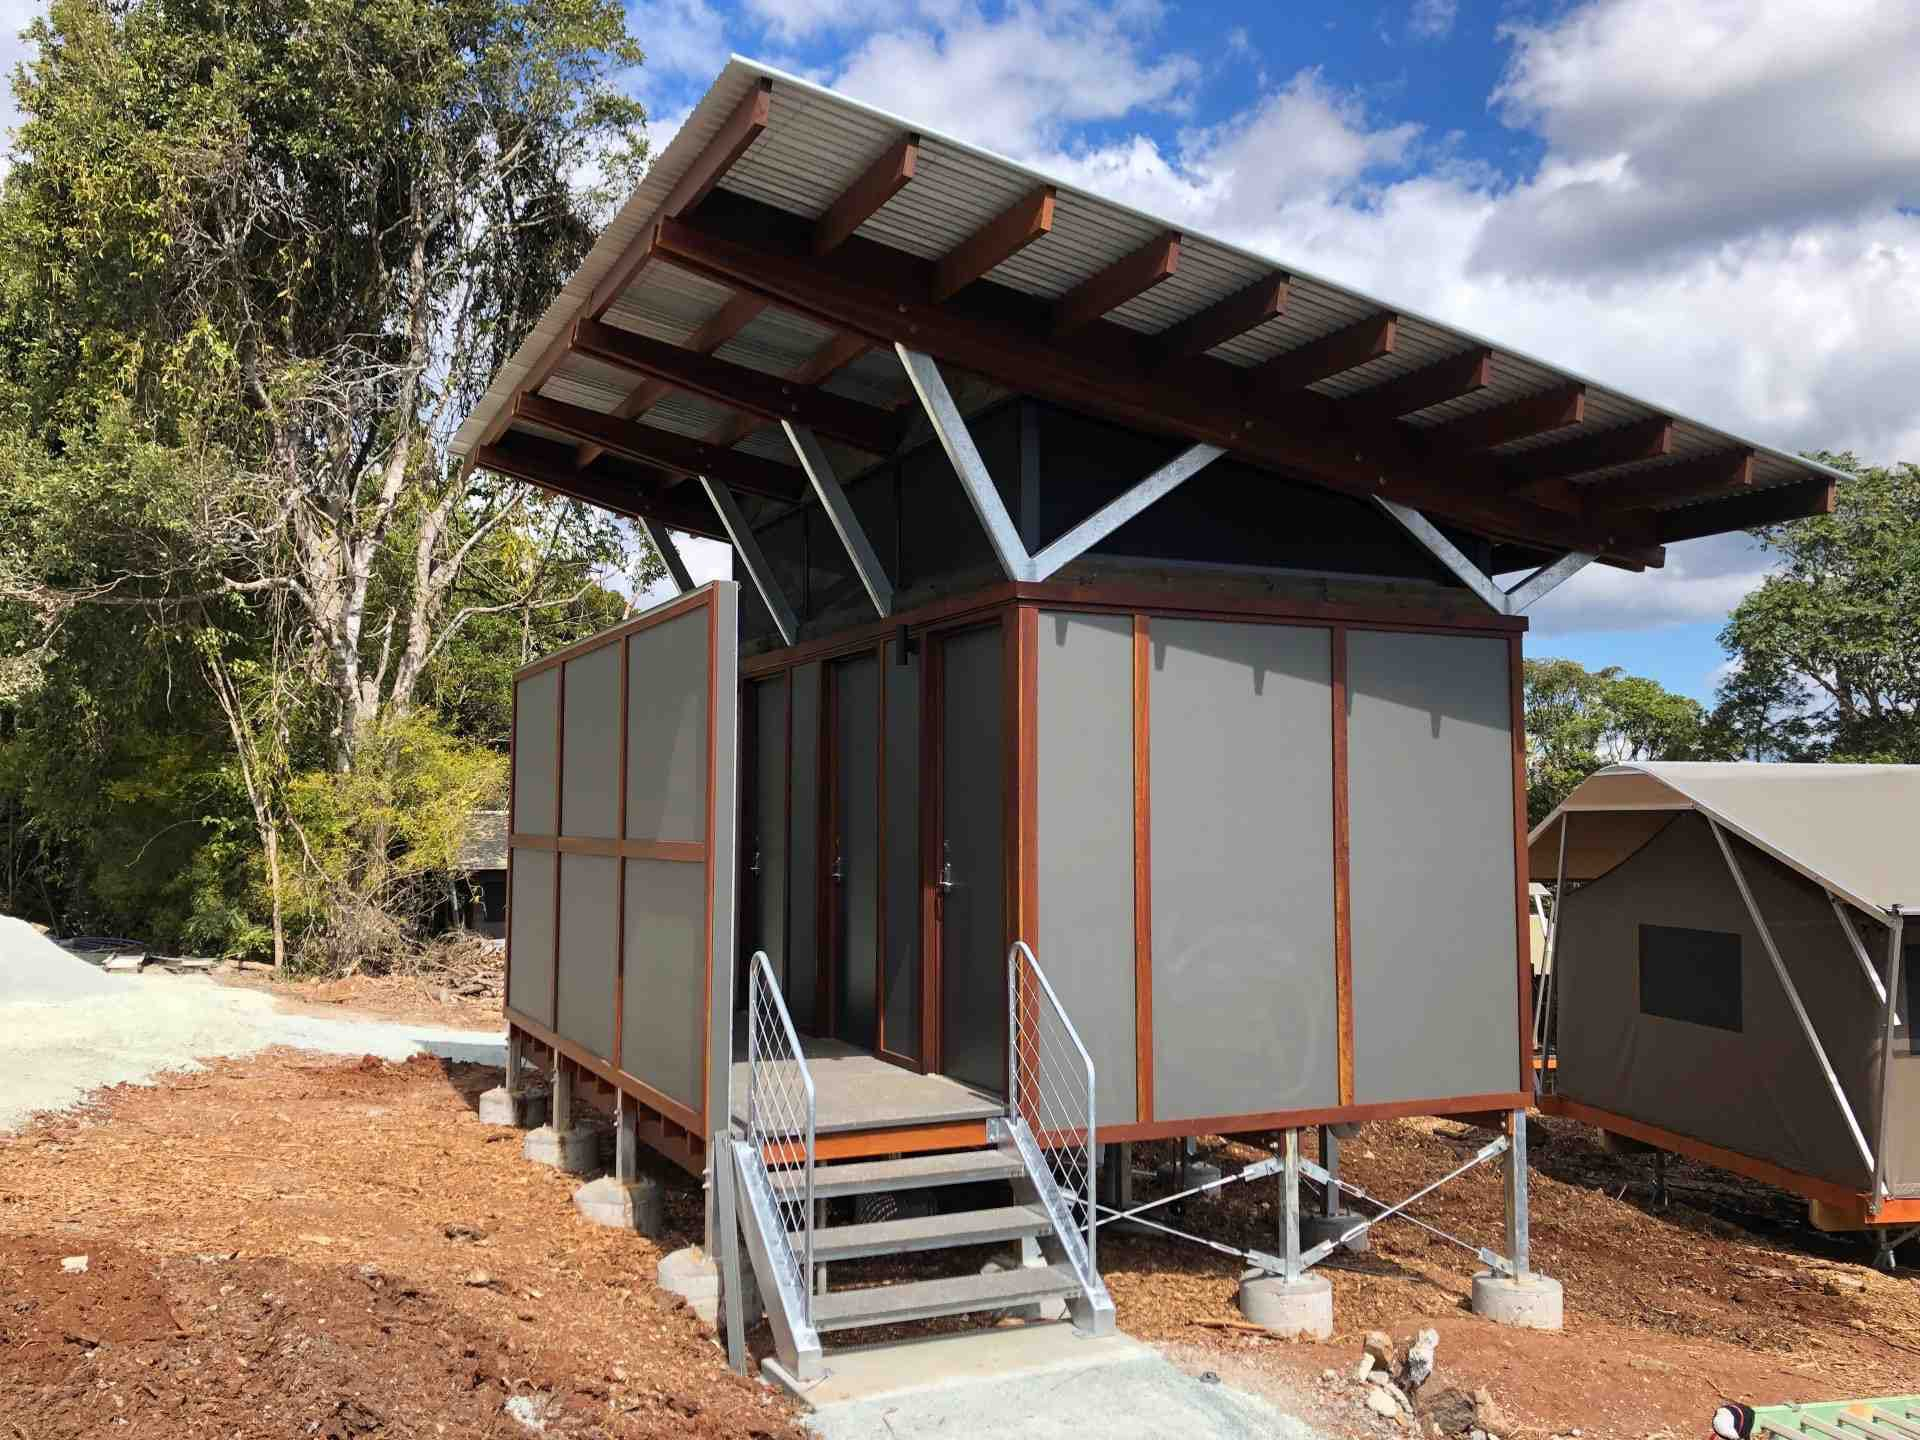 O'Reilly's Campground - Ensuite Building